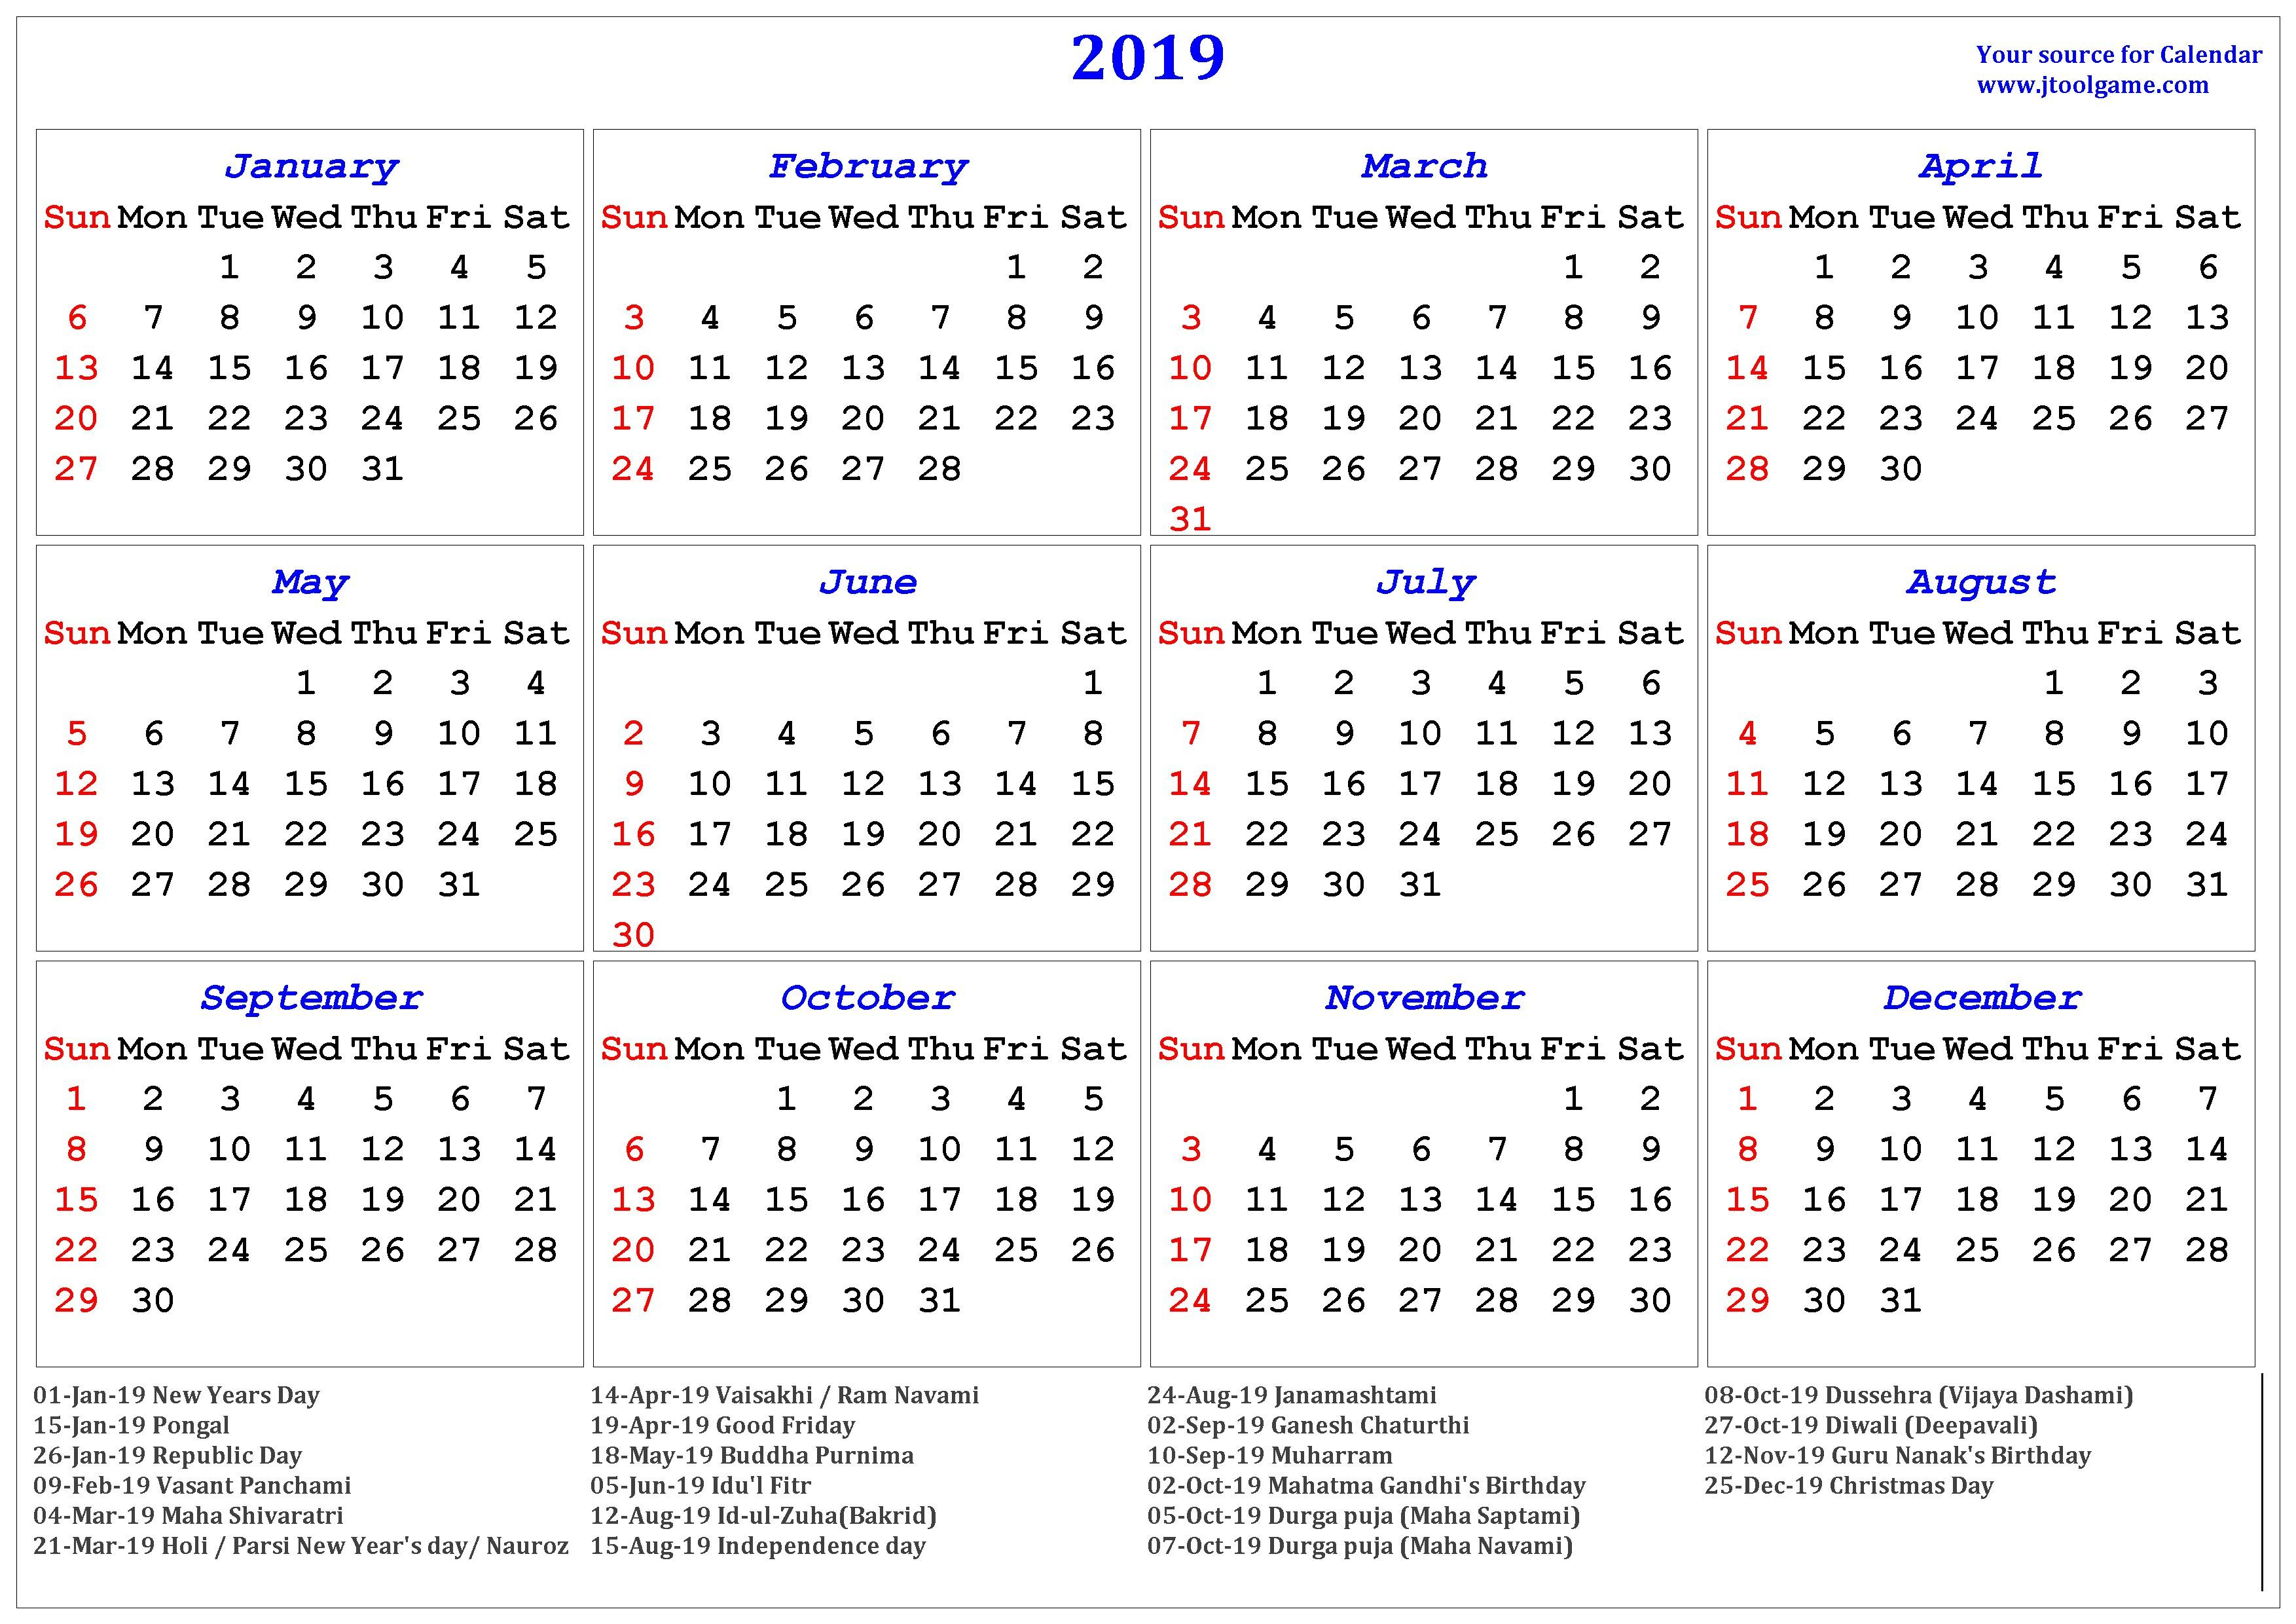 March Calendar Canada Más Caliente Calendar 2019 Holidays India Of March Calendar Canada Más Recientes Flowers March 2019 Desktop Calendar March March2019